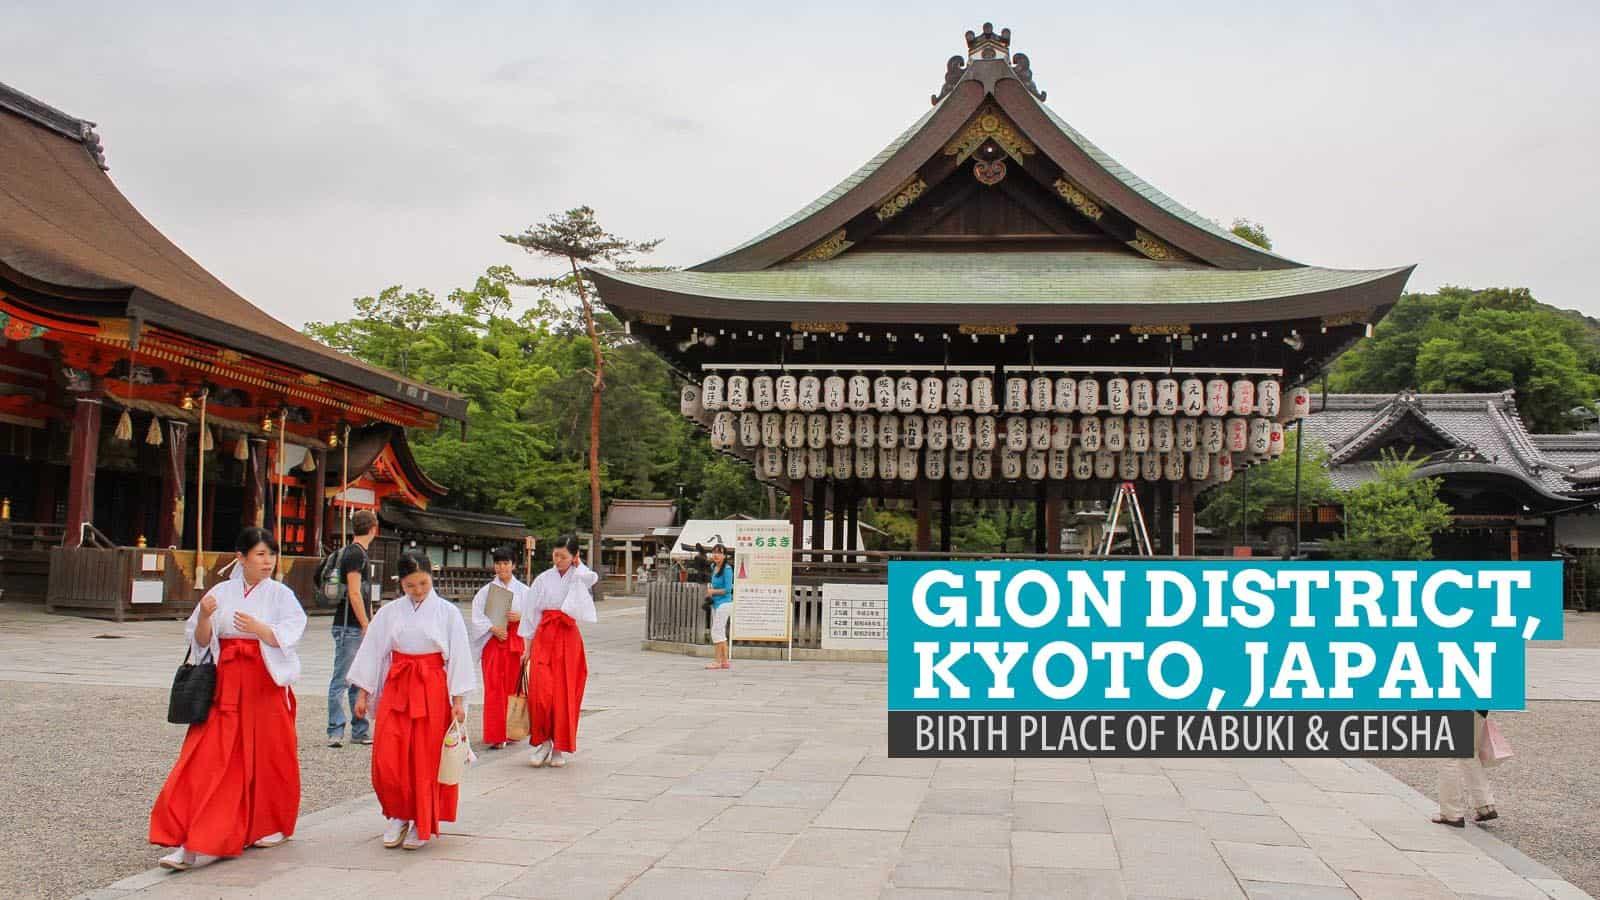 GION DISTRICT, KYOTO: The Birthplace of Kabuki and Geisha